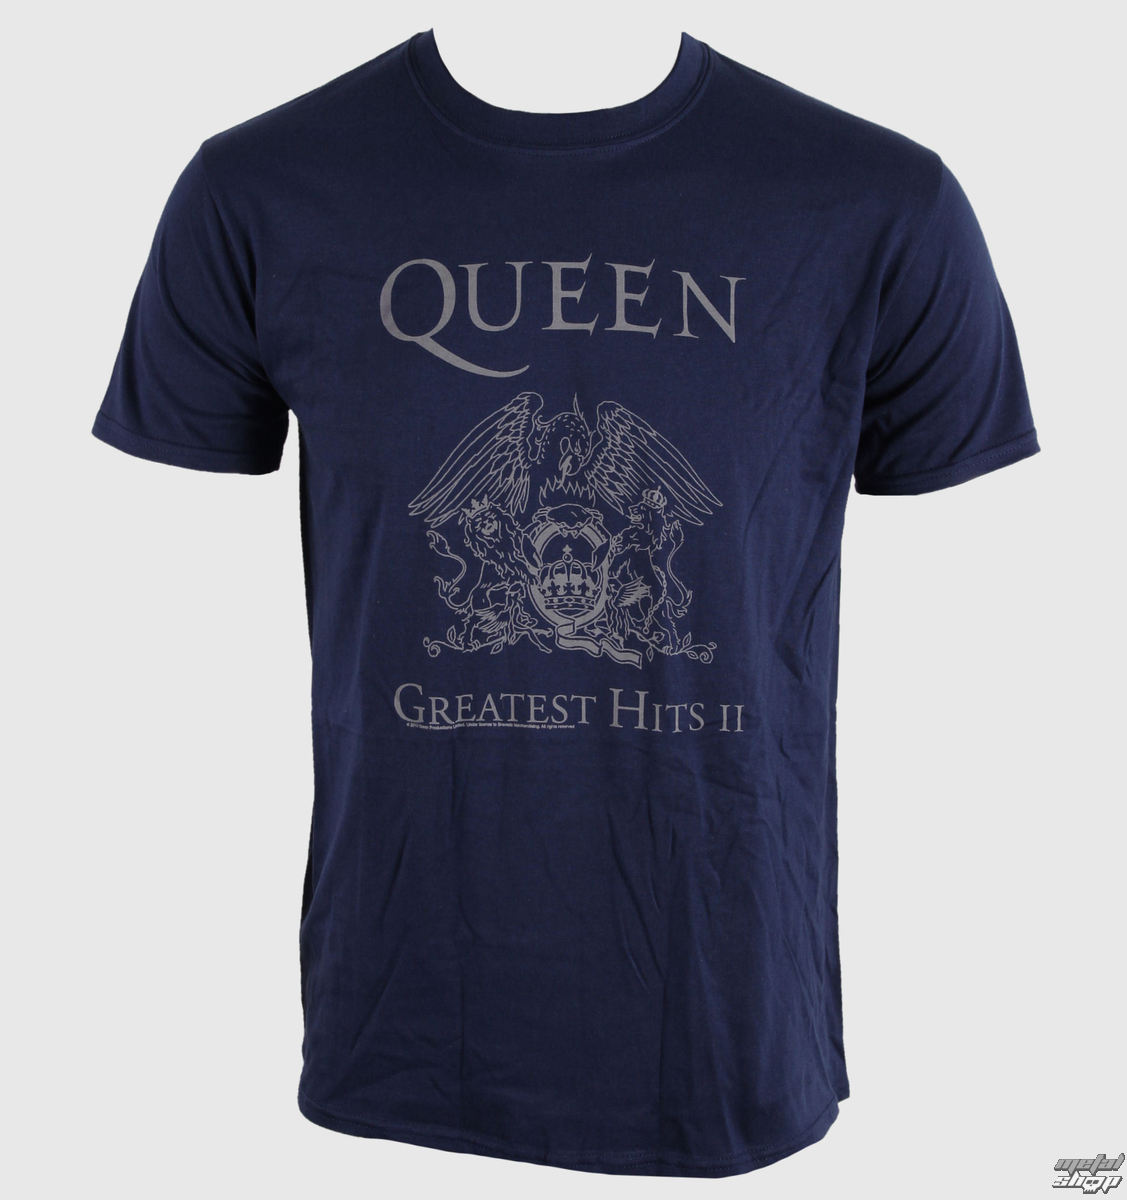 tričko pánske Queen - Greatest Hits II - Navy - BRAVADO EU - QUTS10MBL